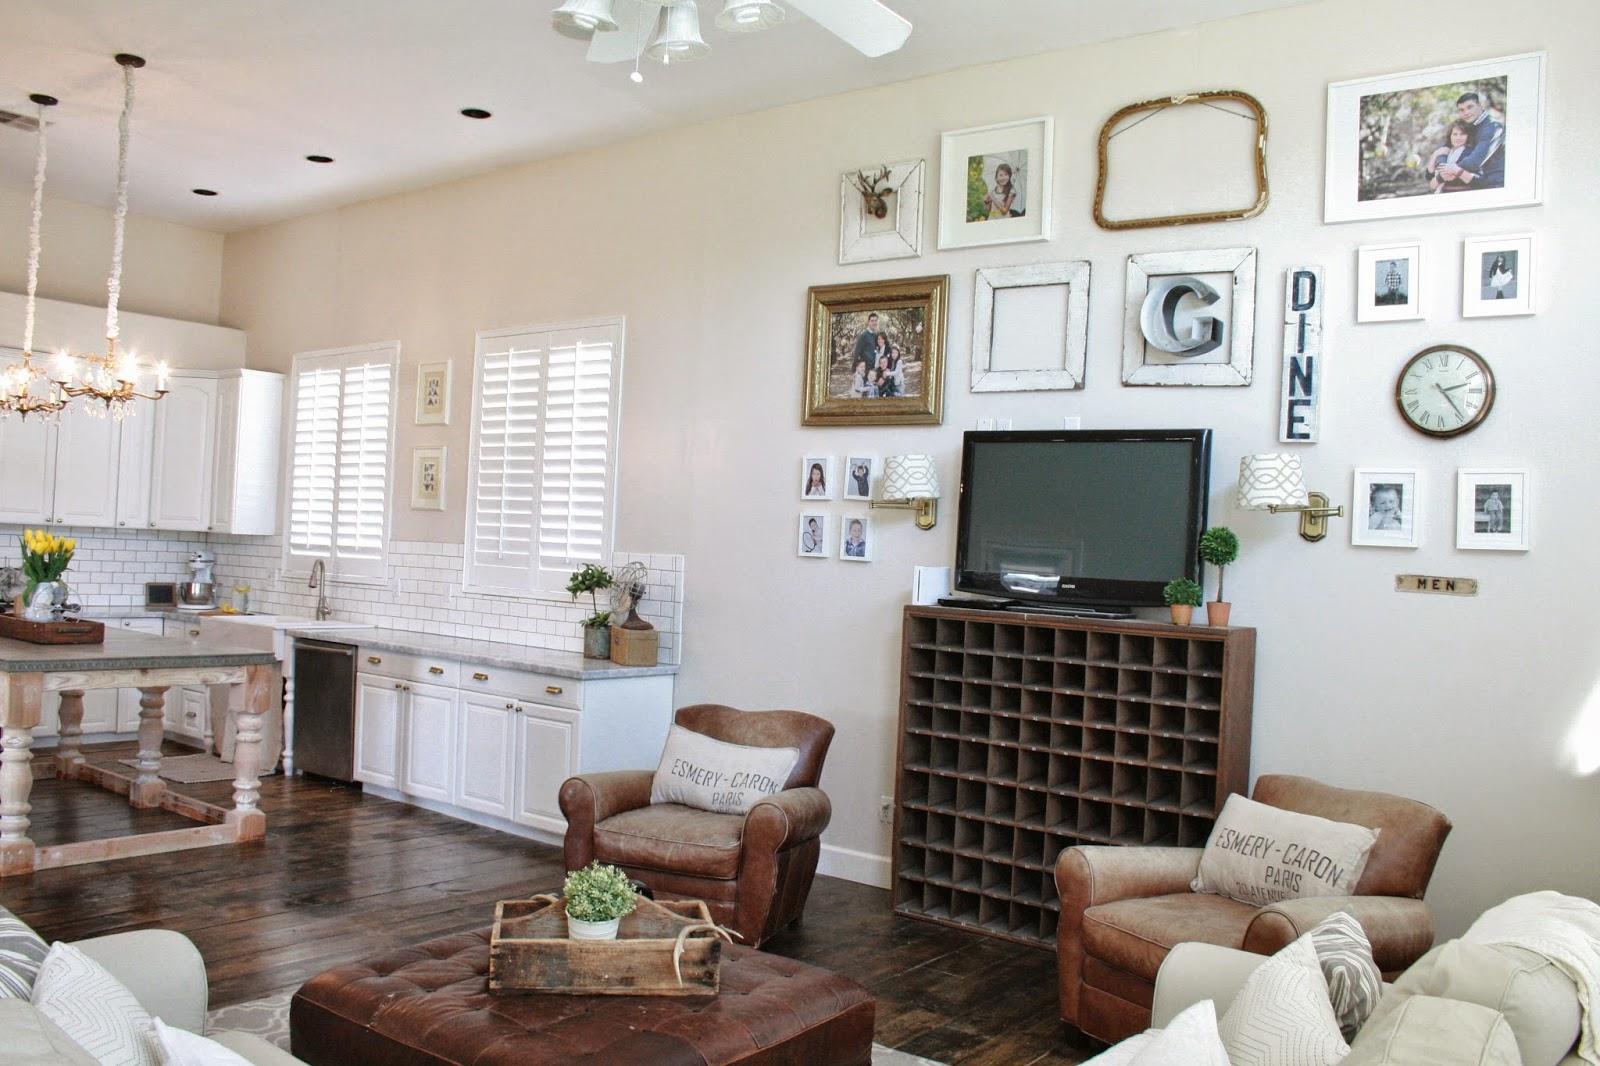 Grand Design: Great Room Renovation